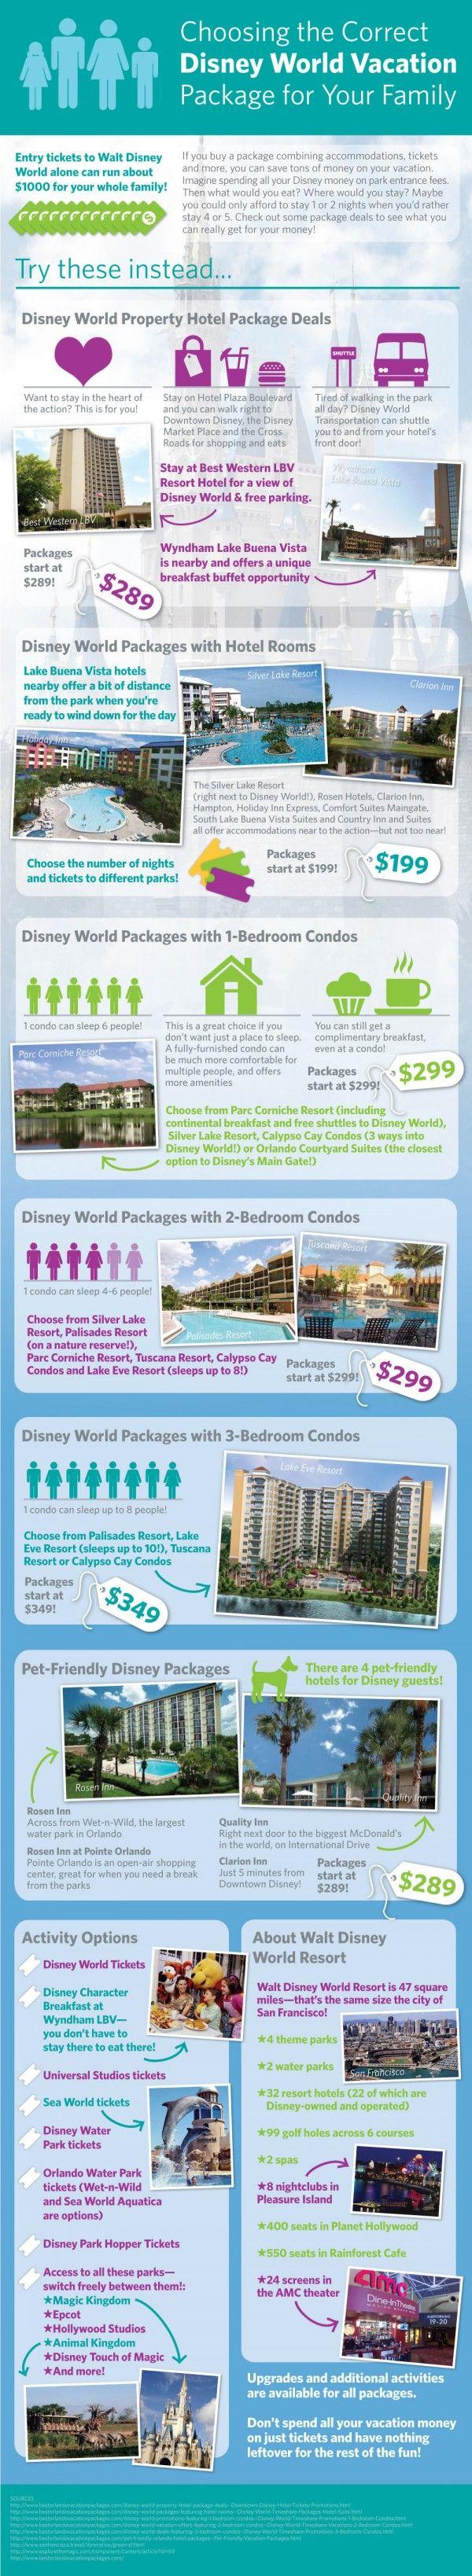 Disney world vacation deals with airfare